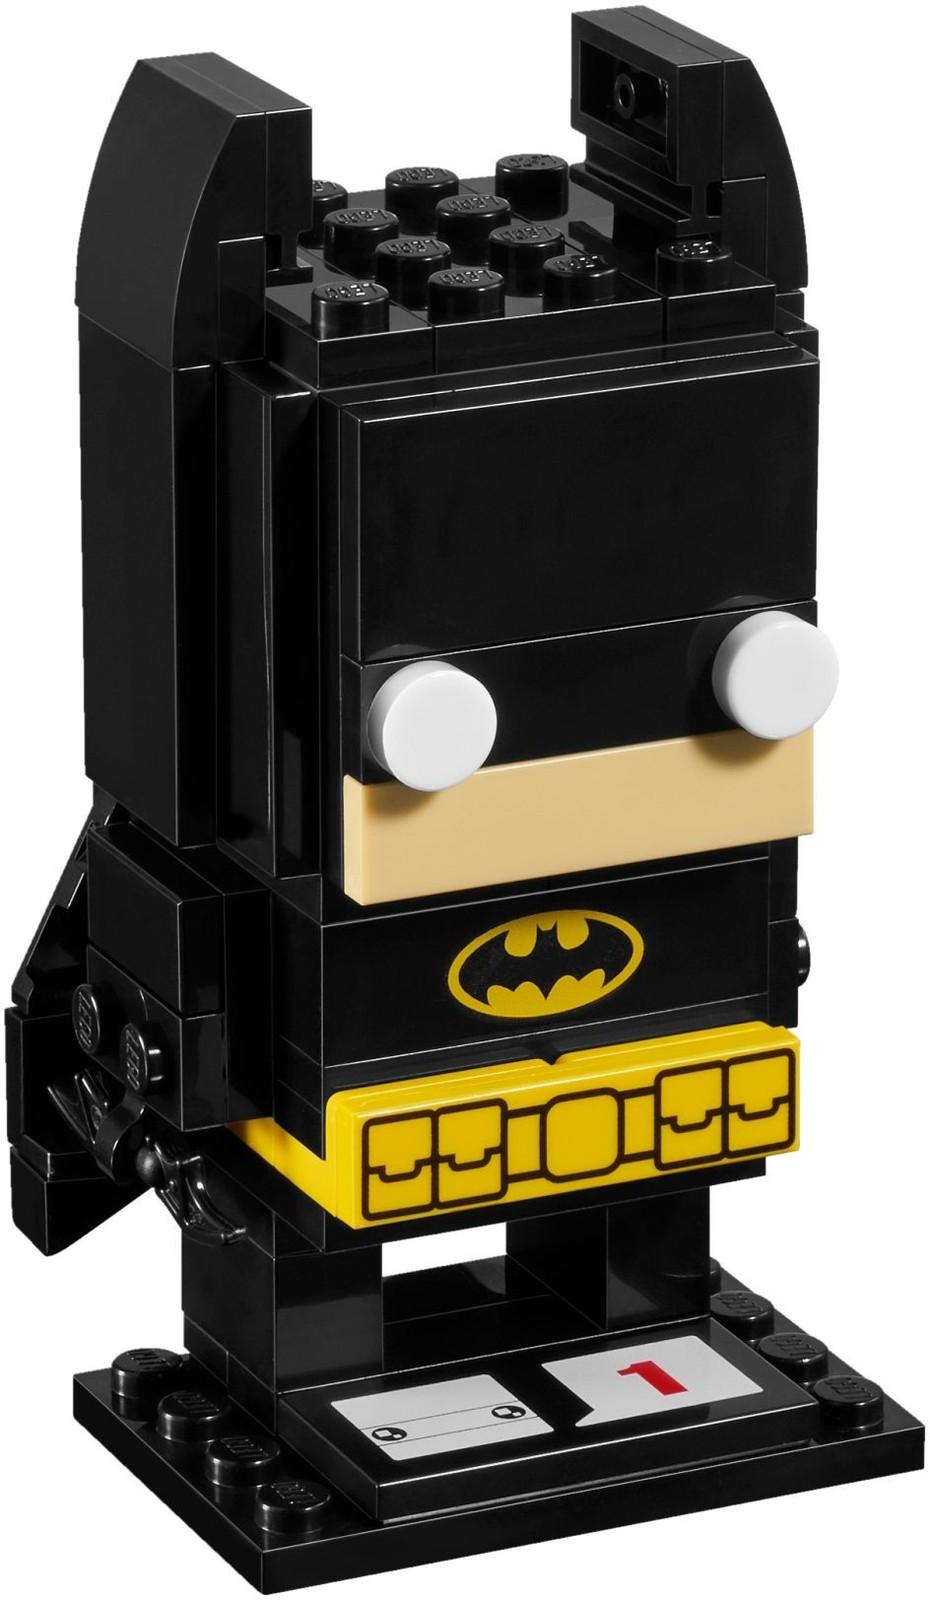 LEGO Brickheadz - Batman (41585) image